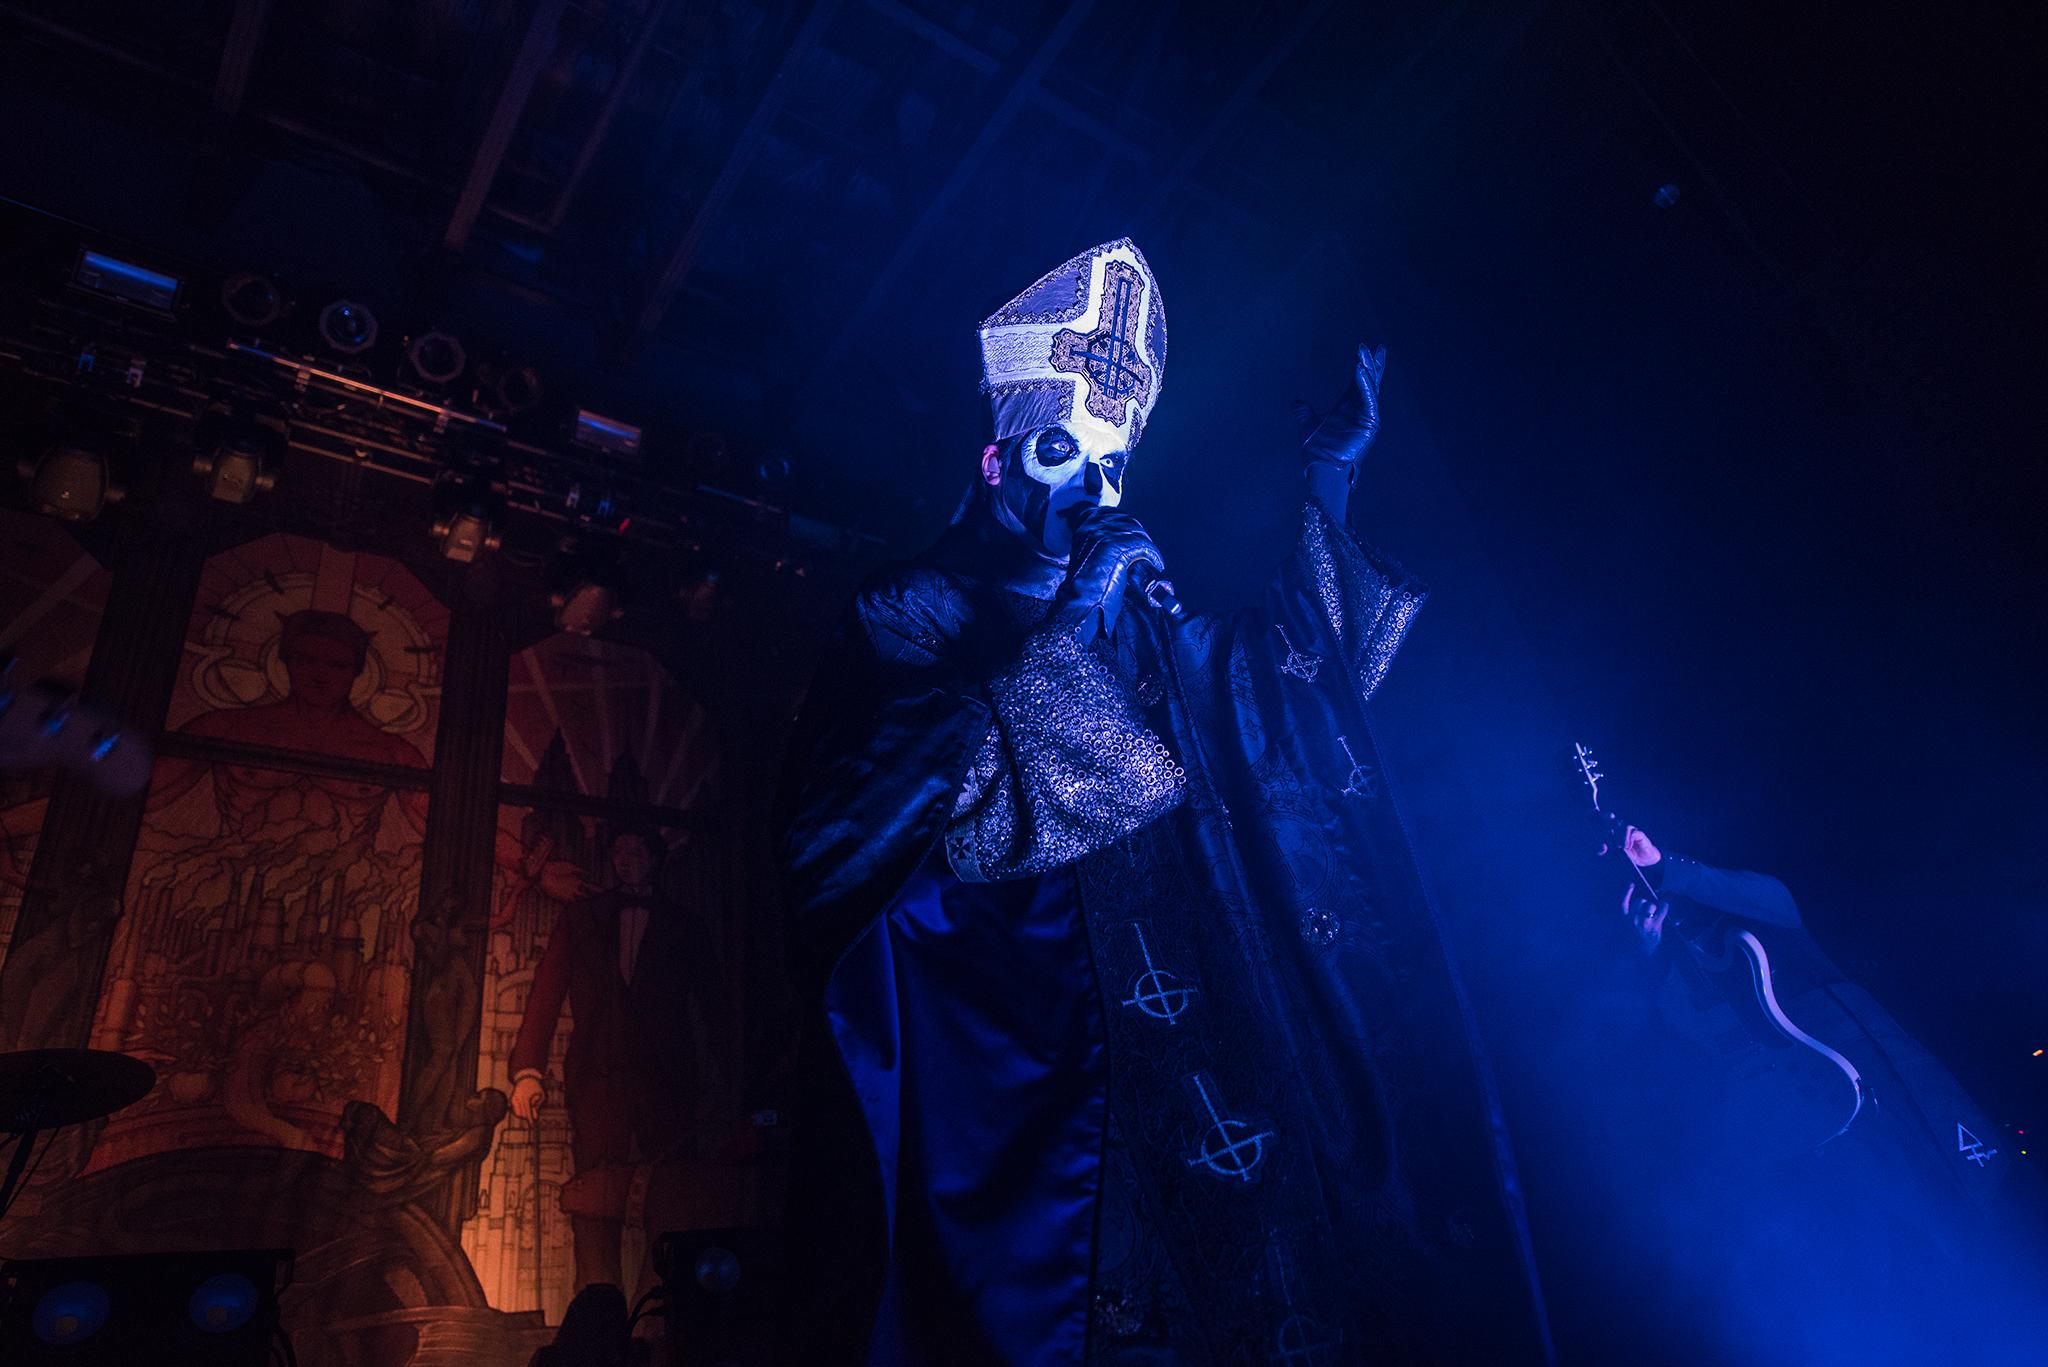 Ghost-Emos-Concert-Photography-Katrina-Barber-7.jpg